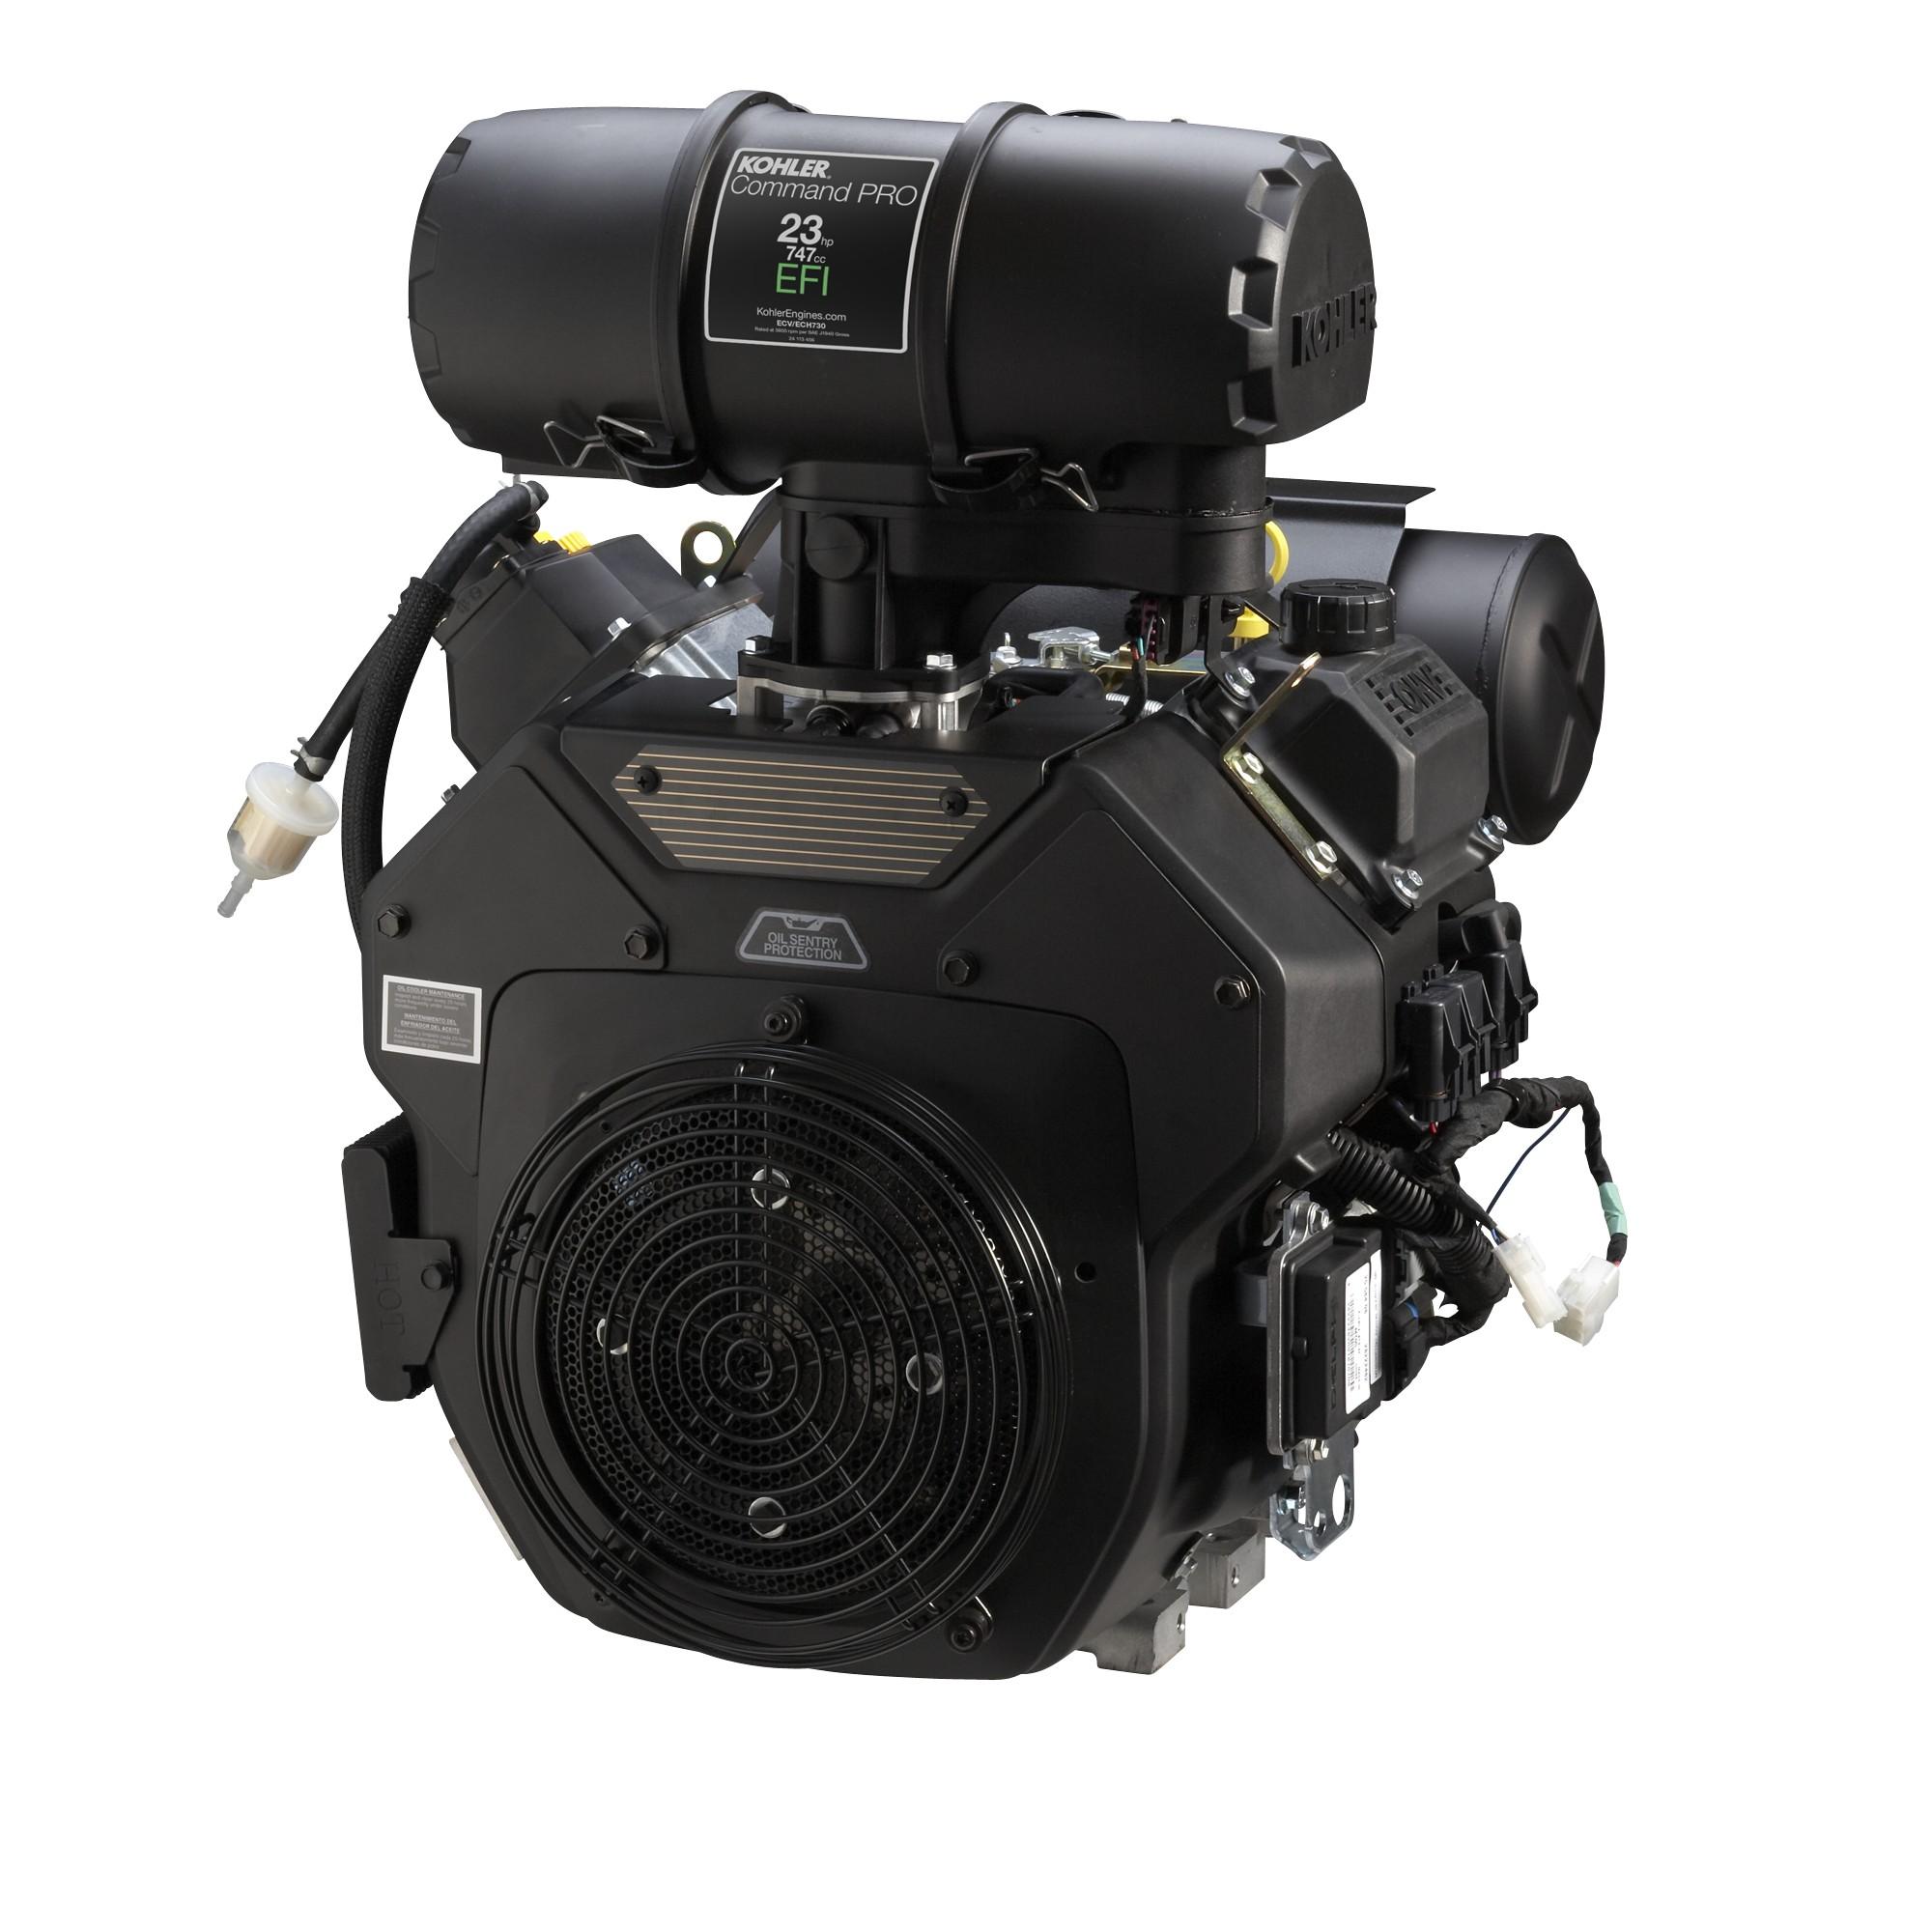 Kohler Command Ech730 Efi Wiring Diagram Guide And Troubleshooting Engines Pro Product Detail Rh Kohlerengines Com For Cv20 Engine Electrical